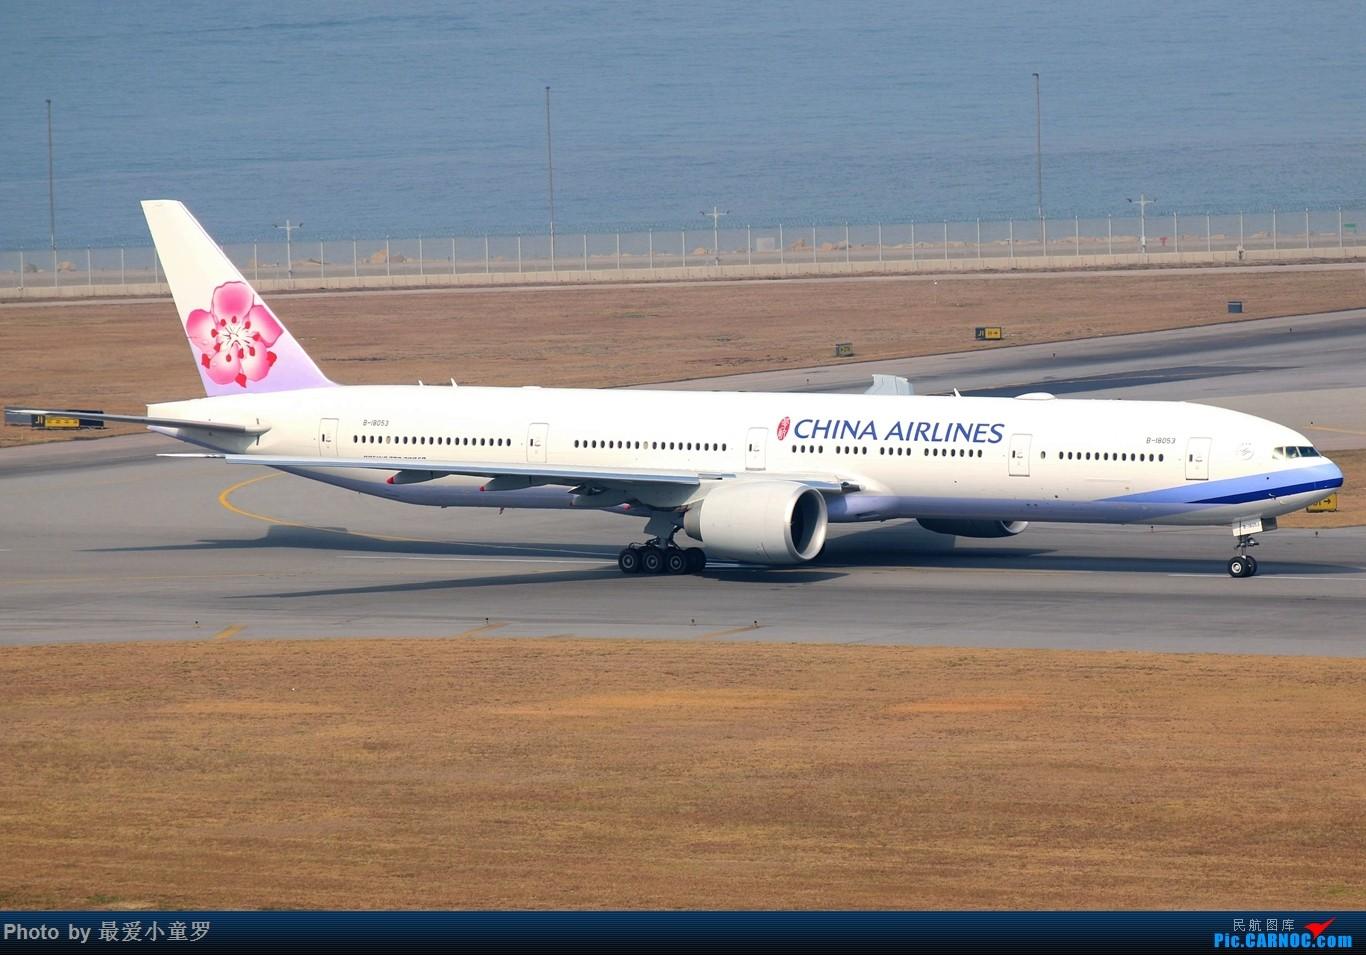 Re:[原创]2015年1月25日香港沙螺湾烂天拍机第二集——波音777 BOEING 777-300ER B-18053 中国香港赤鱲角国际机场